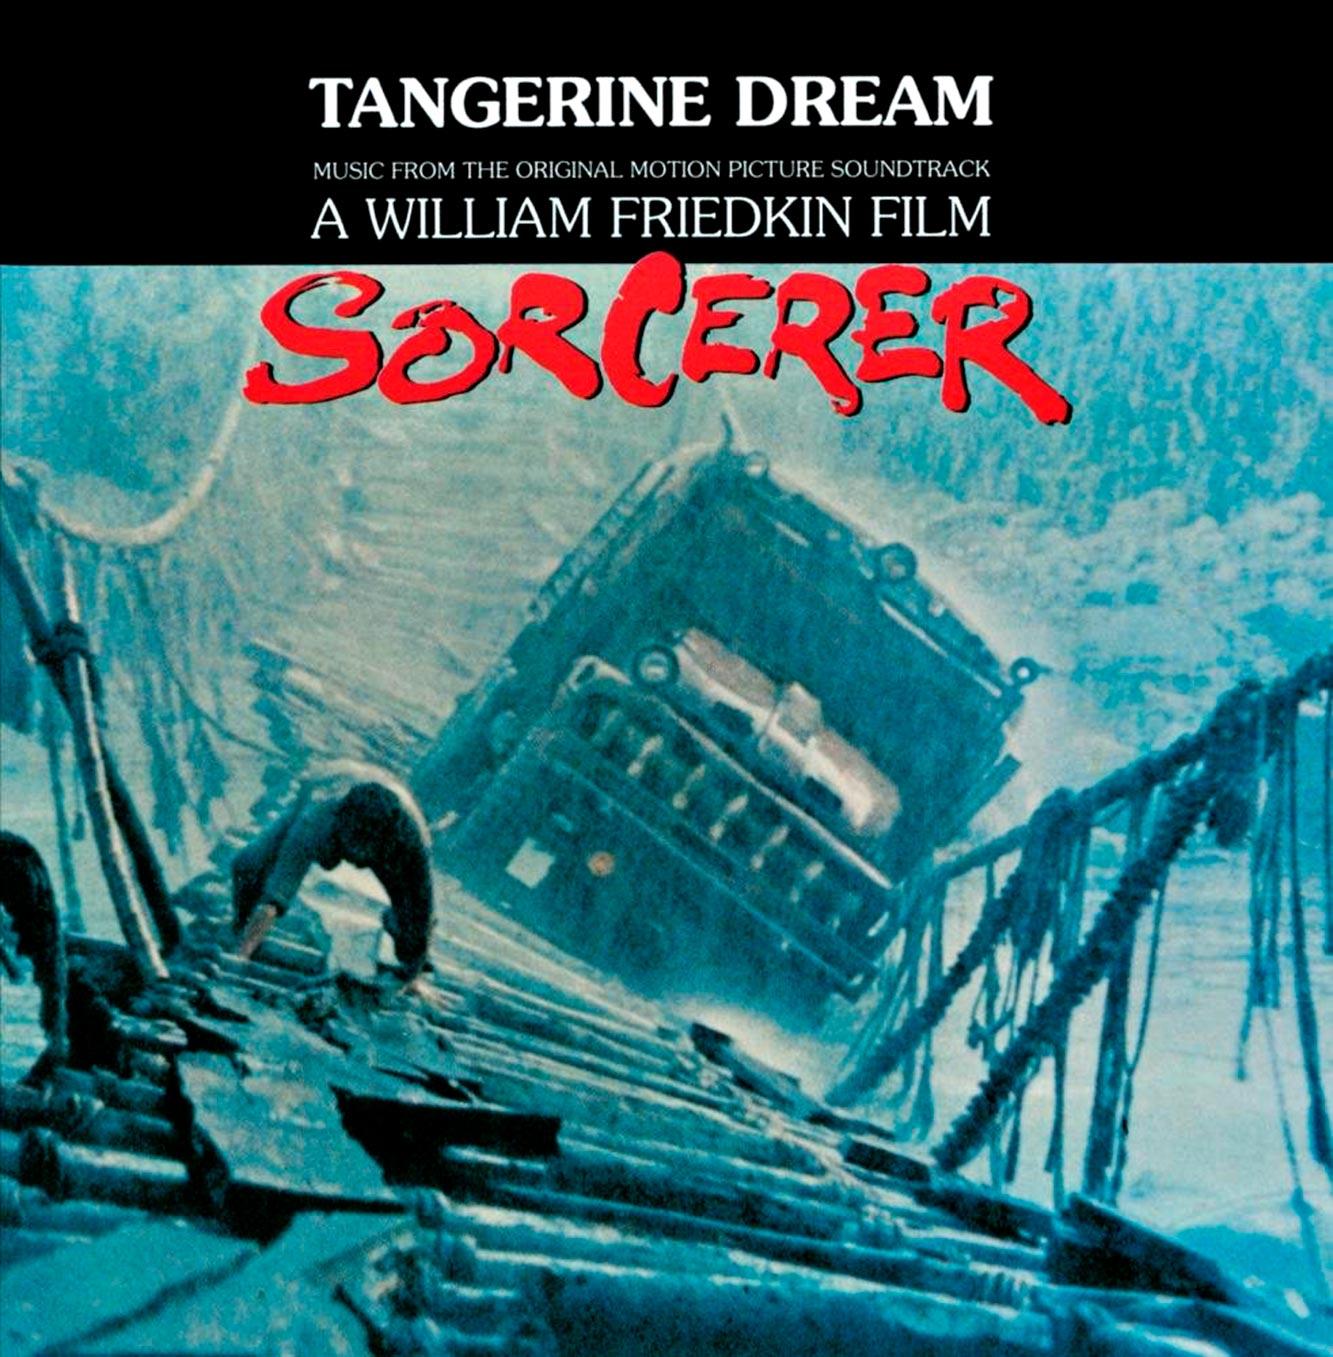 Tangerine Dream soundtrack